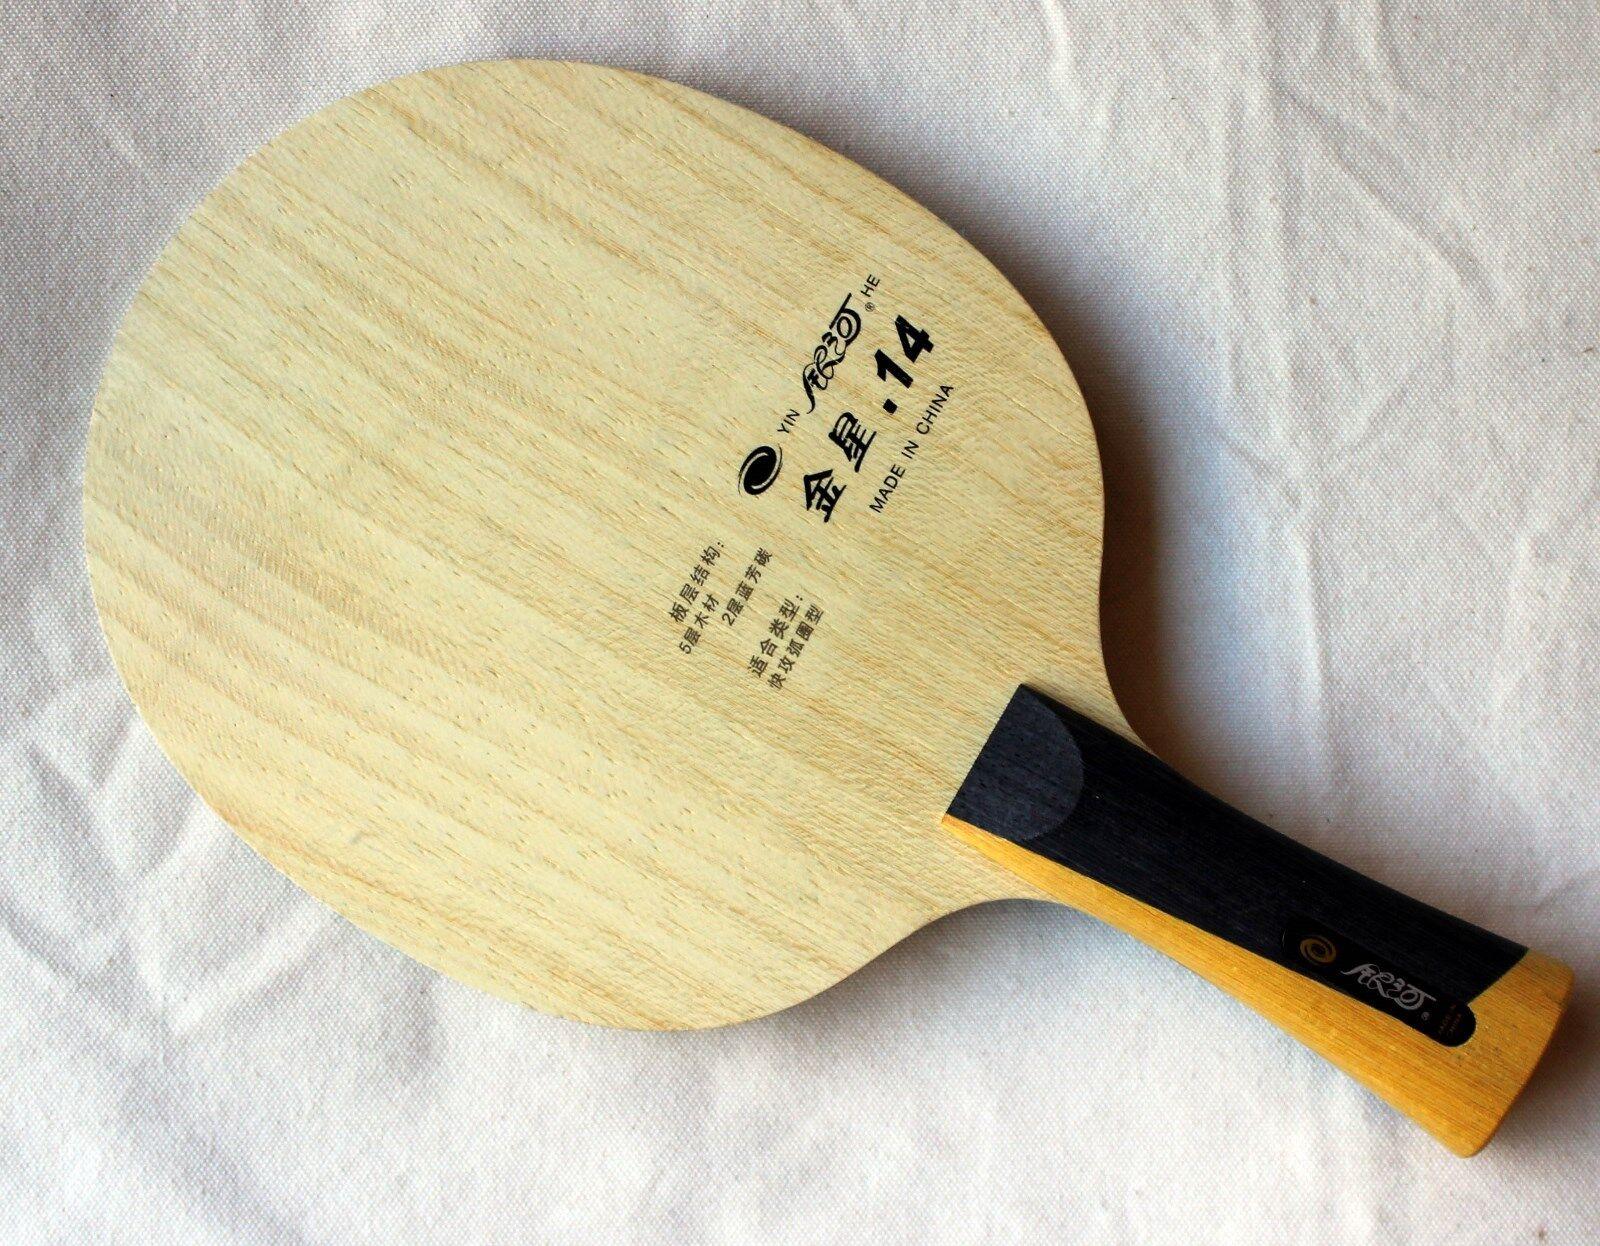 Yinhe/GALAXY Venus .14 V14 V-14 Tennis da Tavolo Lama, carbokev, spento, NUOVO, GBP